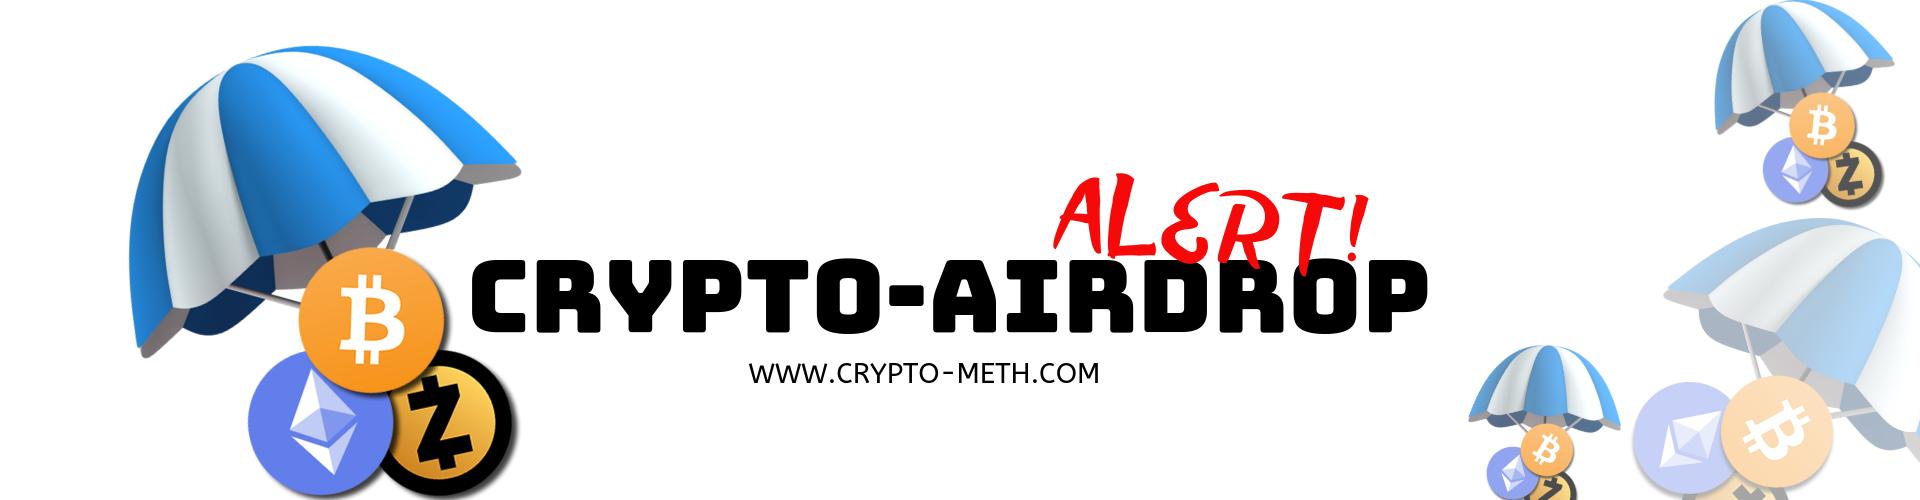 CRYPTO-AIRDROP ALERT | Publish0x